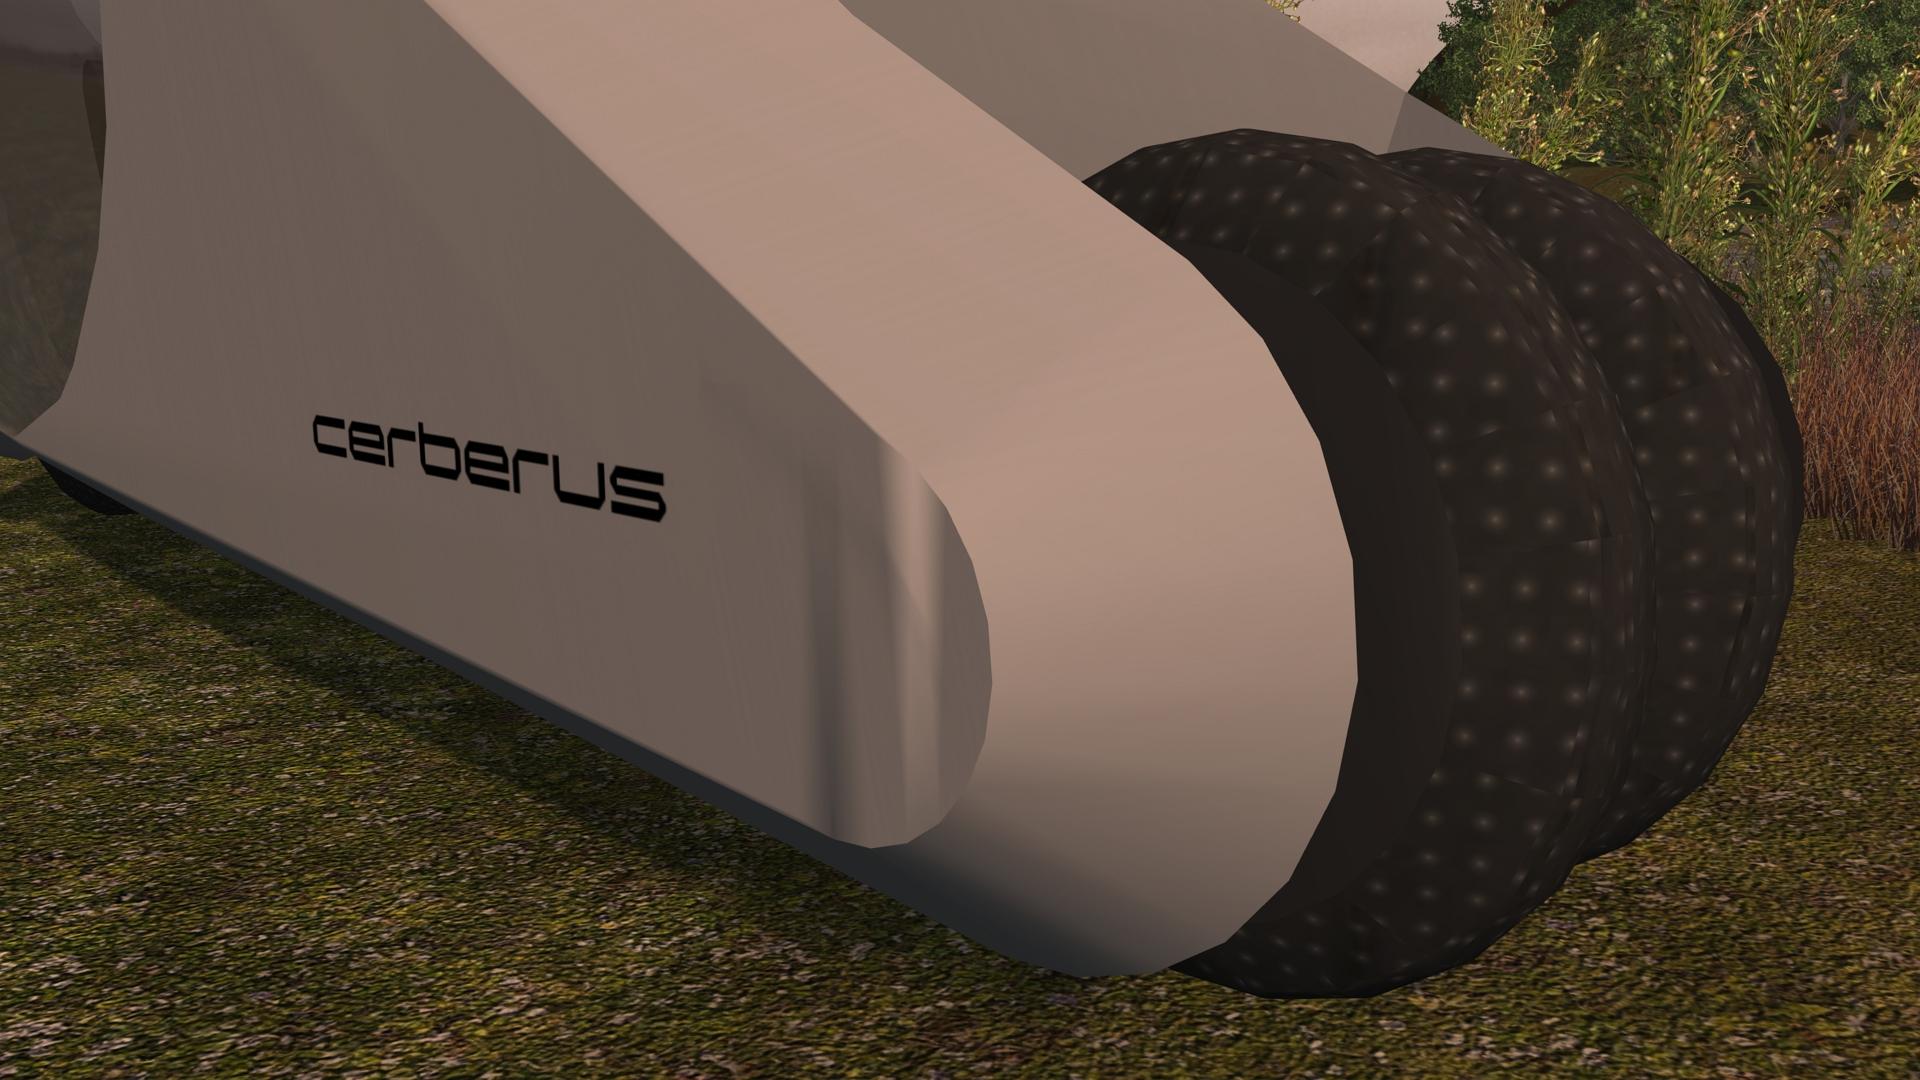 spotted_cerberus_tires.jpg